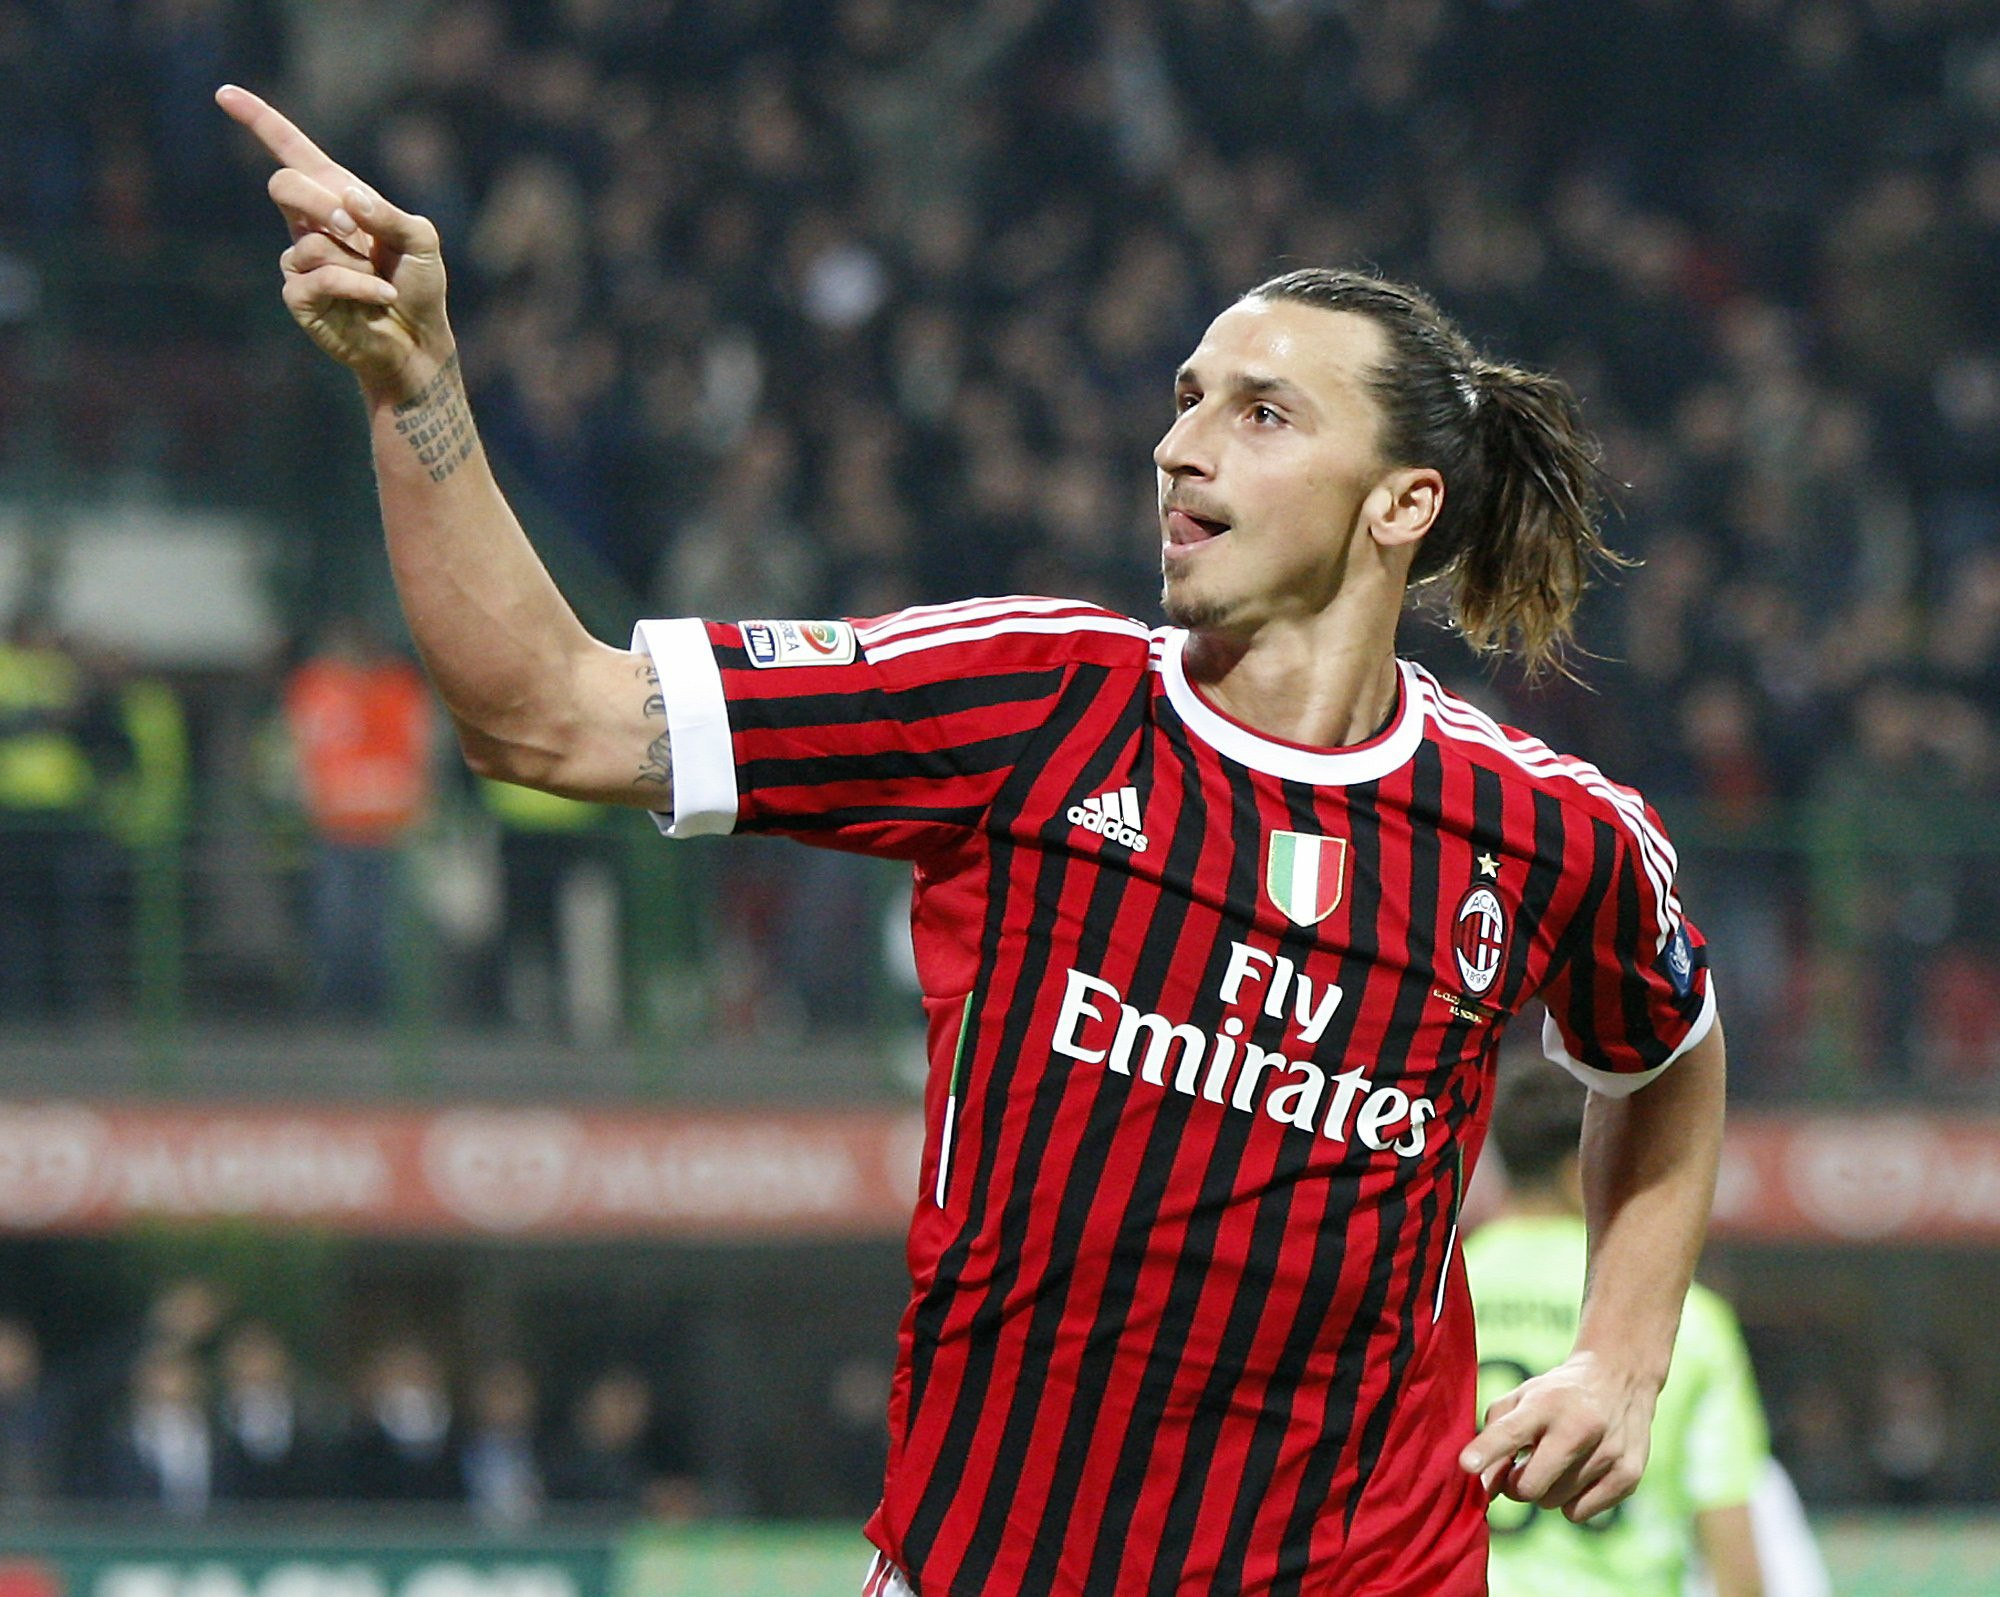 La Gazzetta dello Sport | მარკო ფასონე იბრაჰიმოვიჩზე დაფიქრდა!